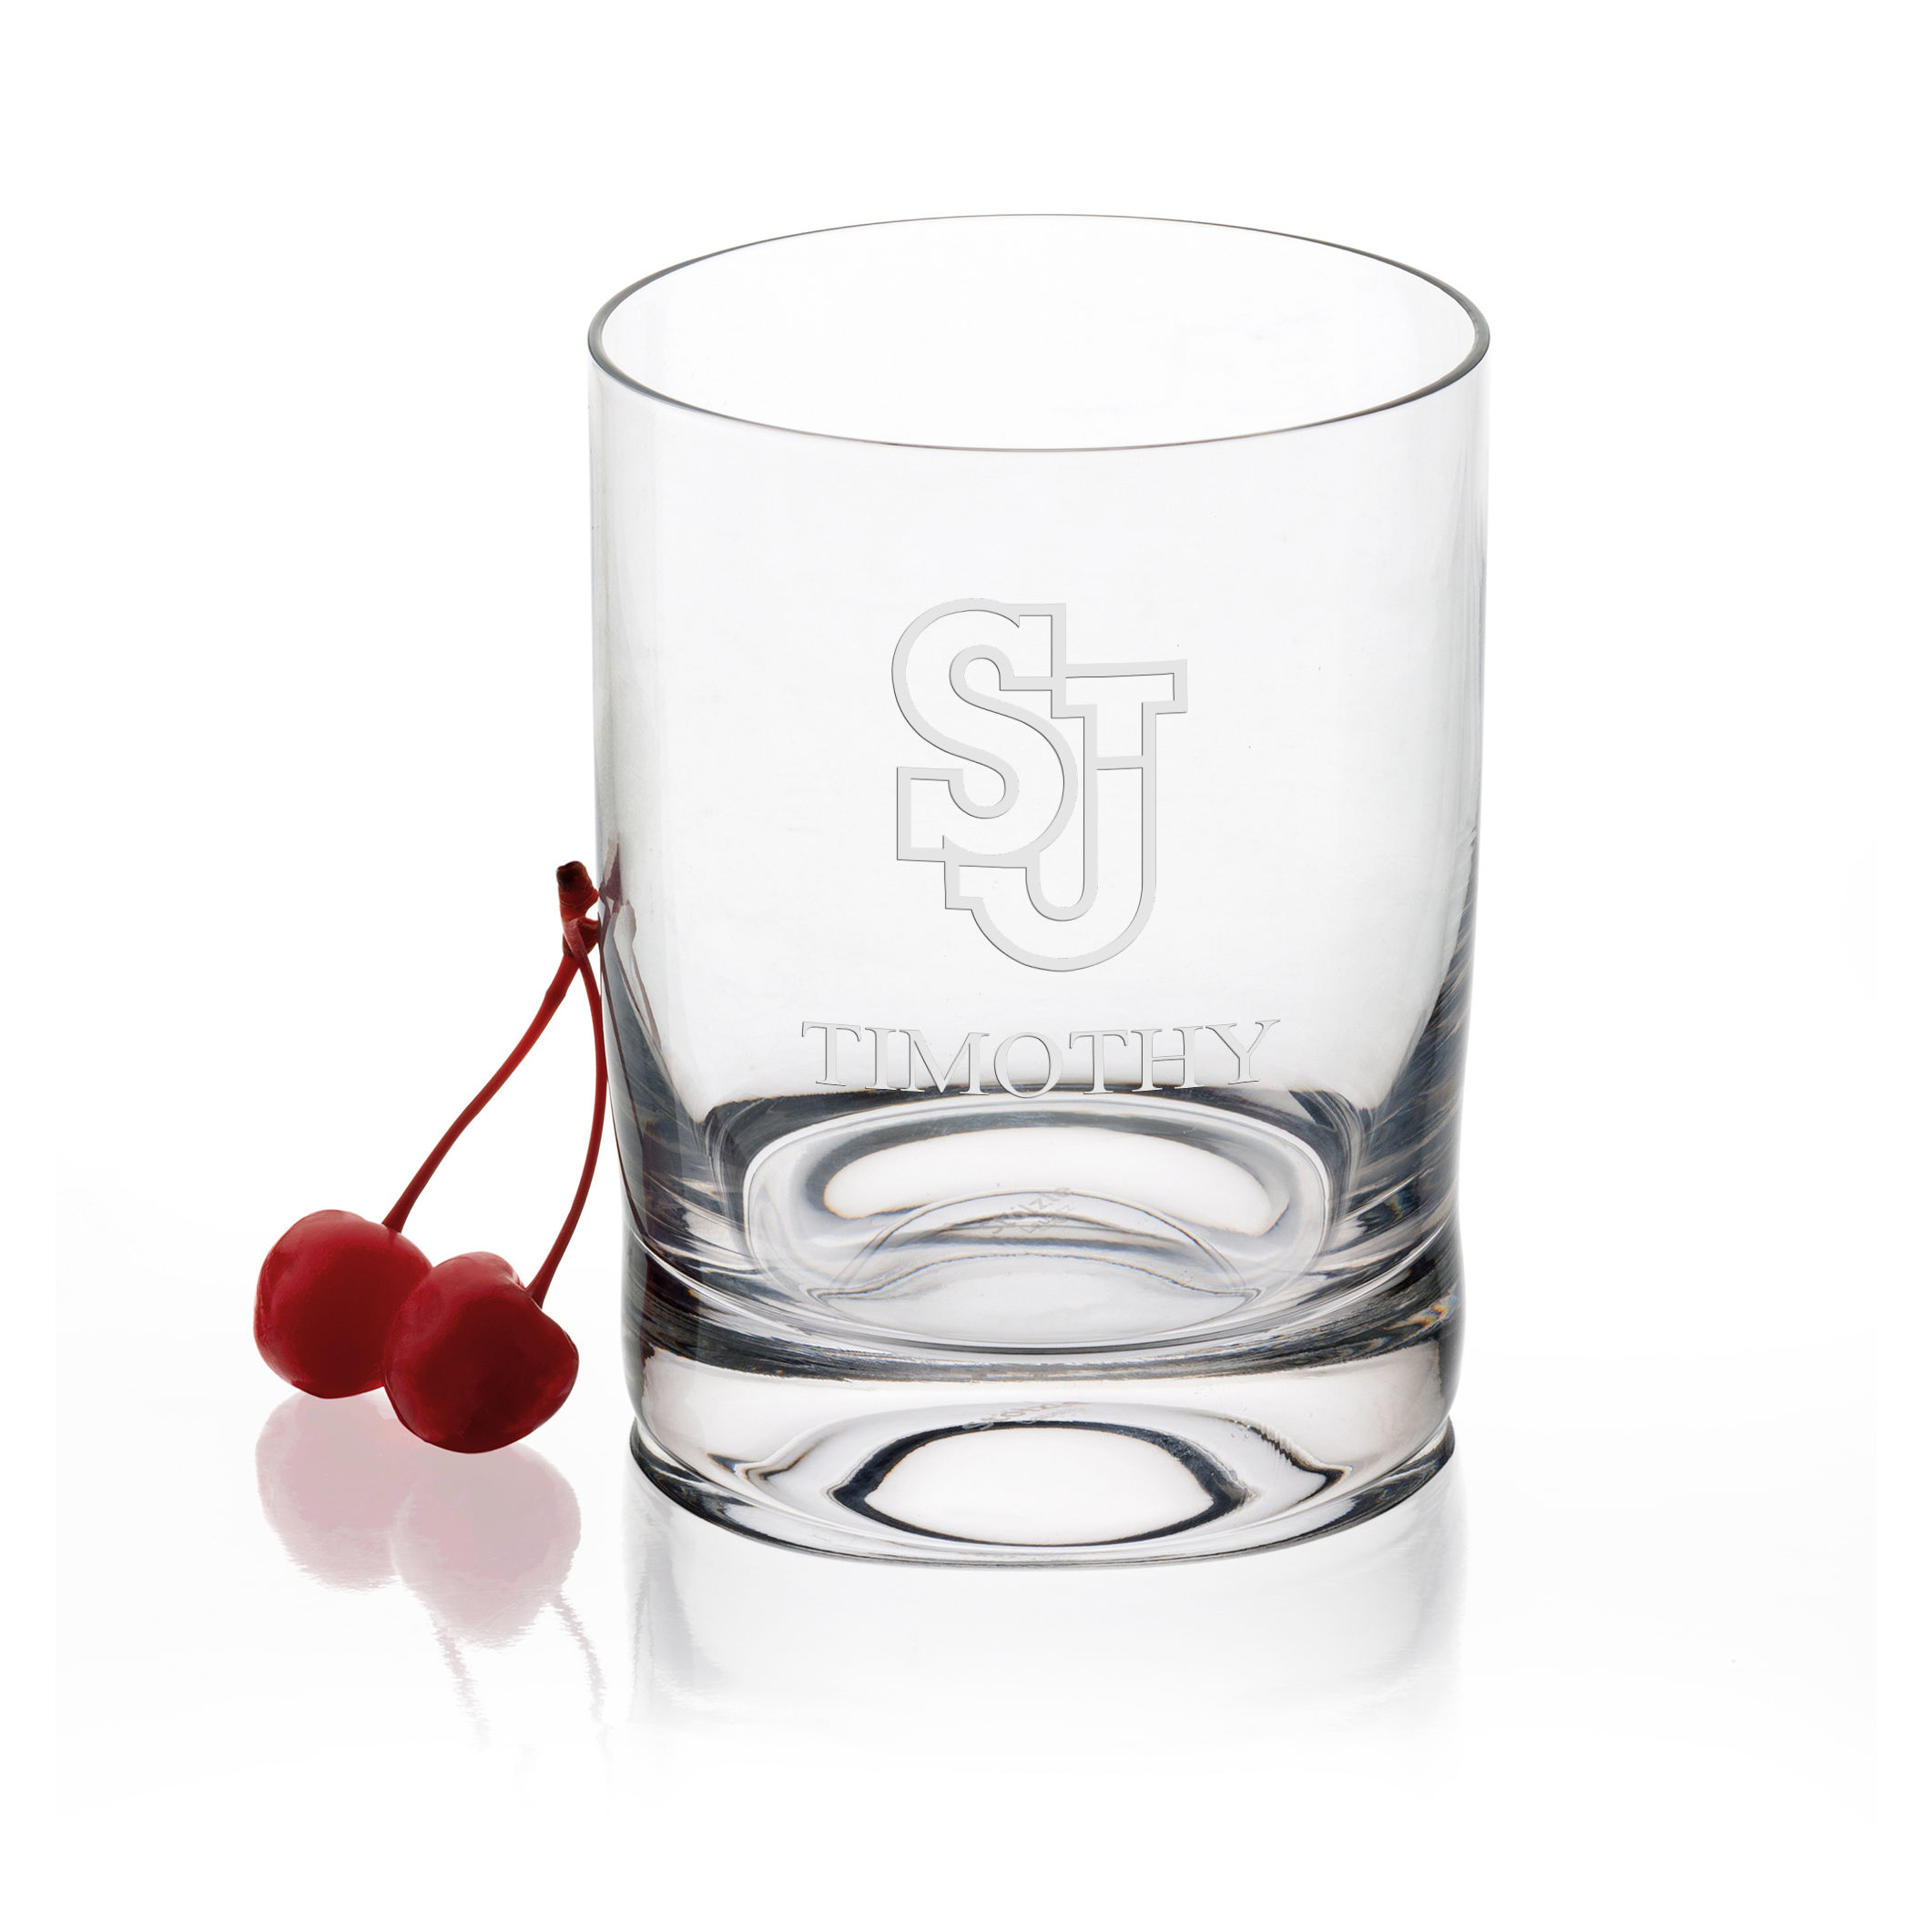 St. John's University Tumbler Glasses - Set of 4